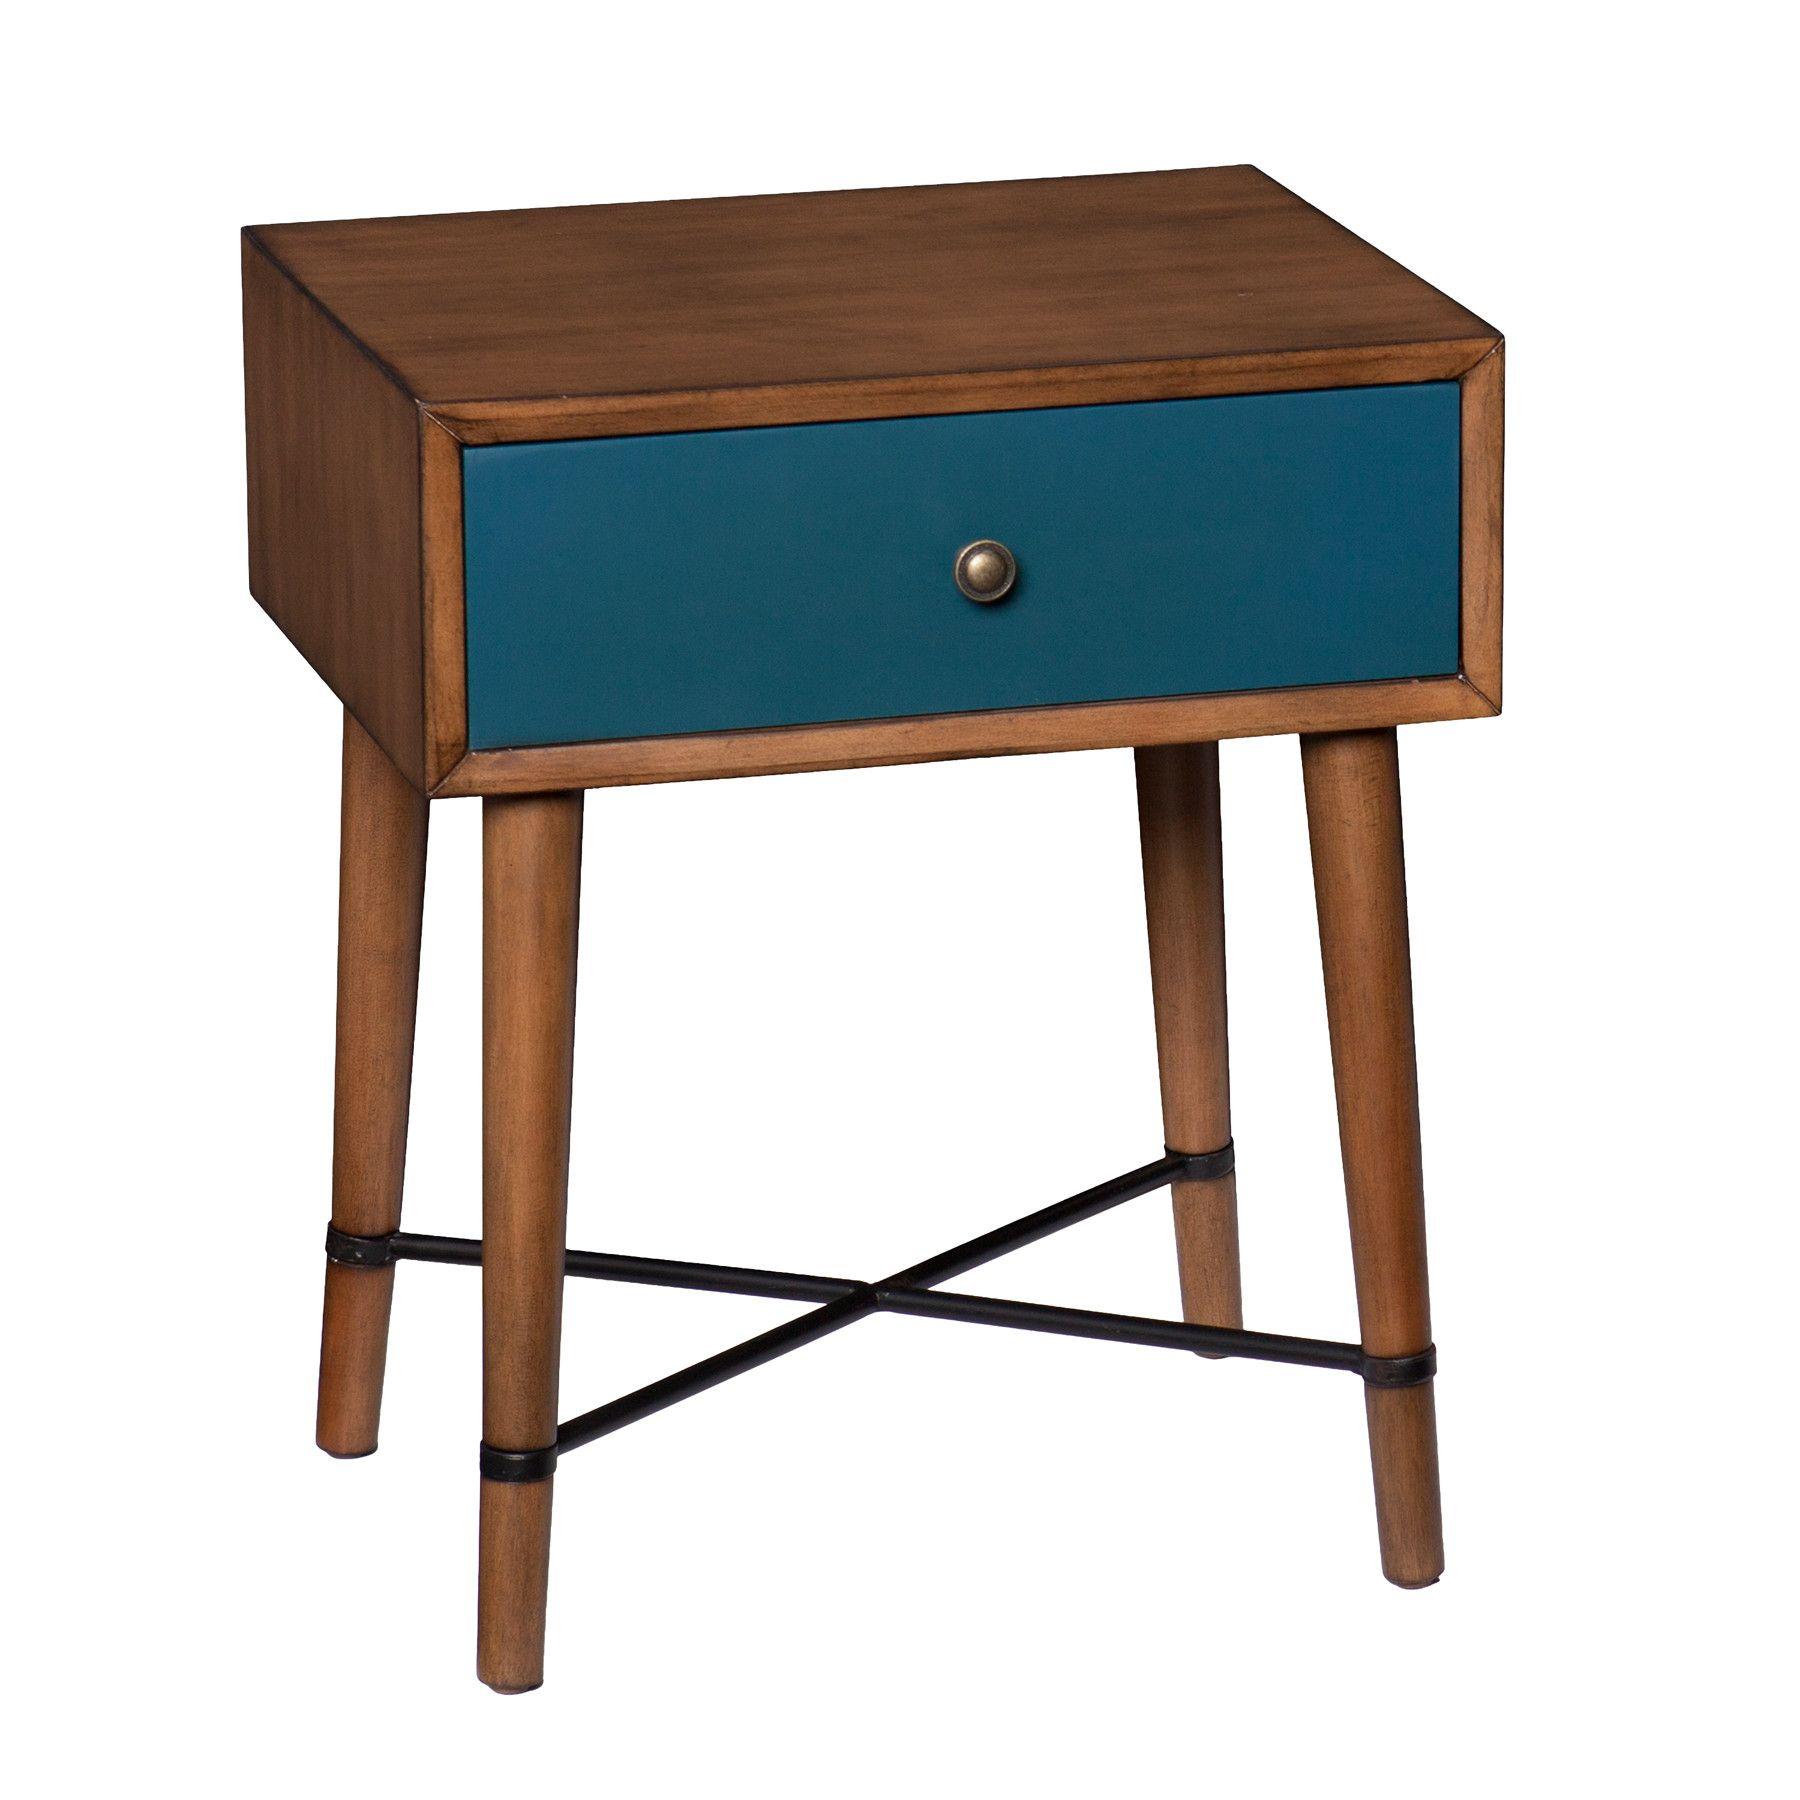 Wildon Home ® Novato End Table Furniture, End tables